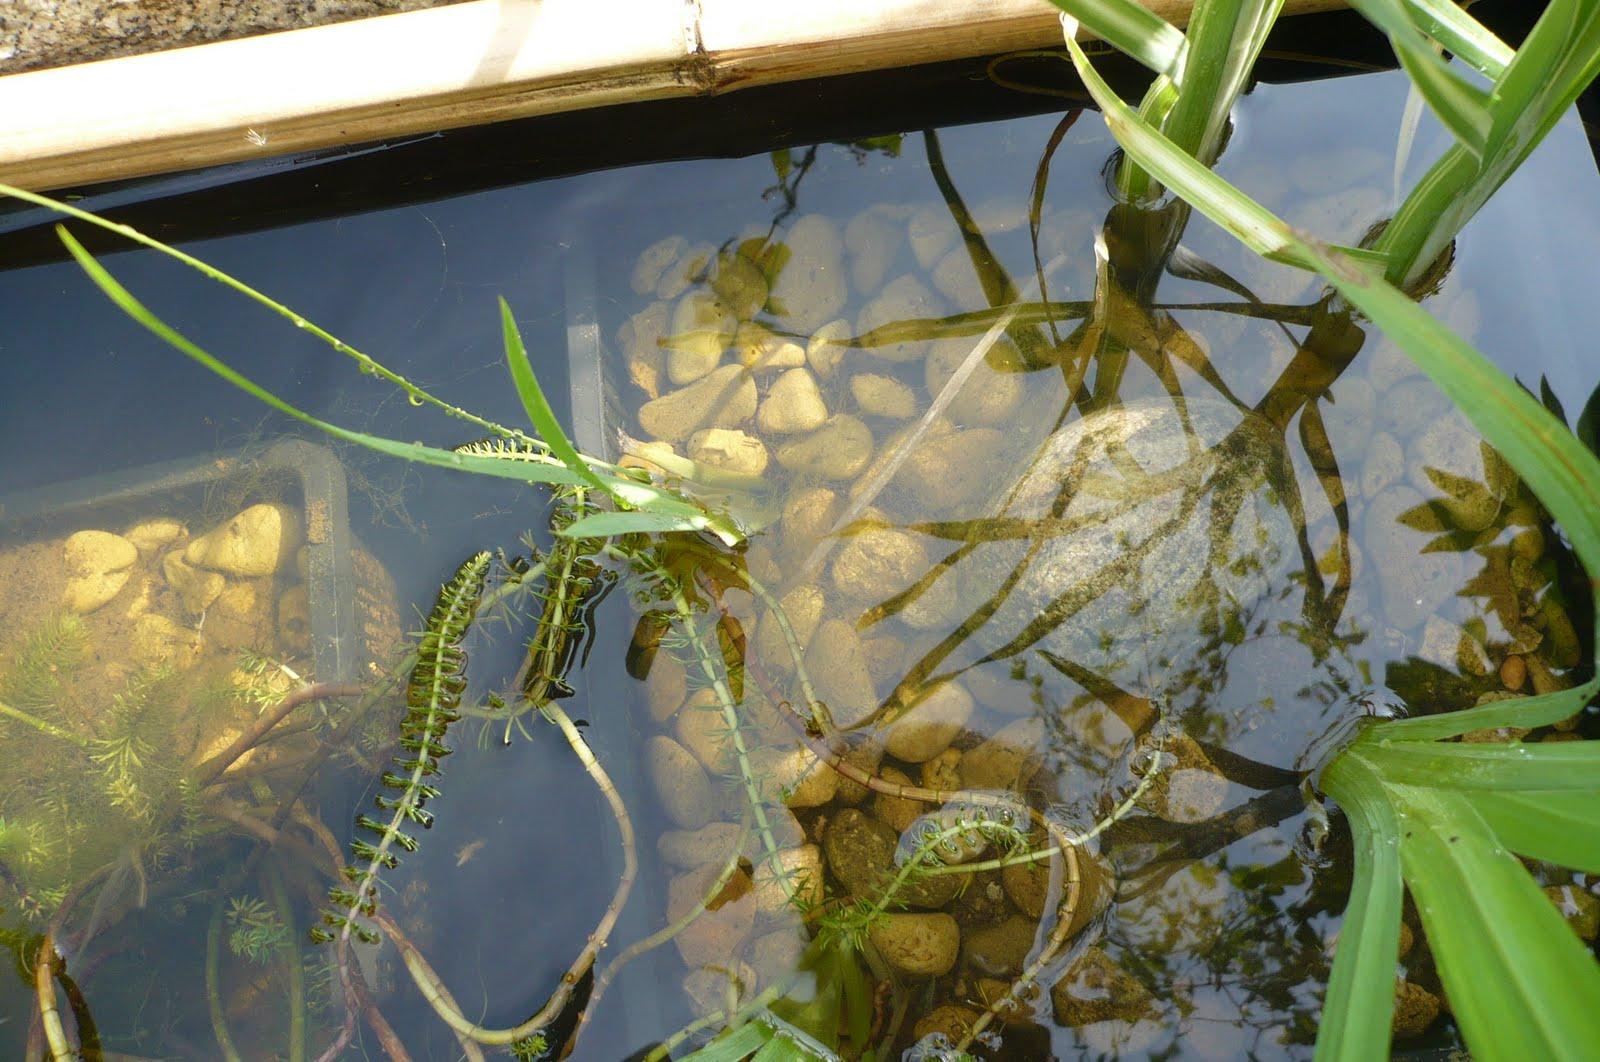 Le jardin des grandes vignes eau au jardin - Bassin de jardin preforme grande taille ...